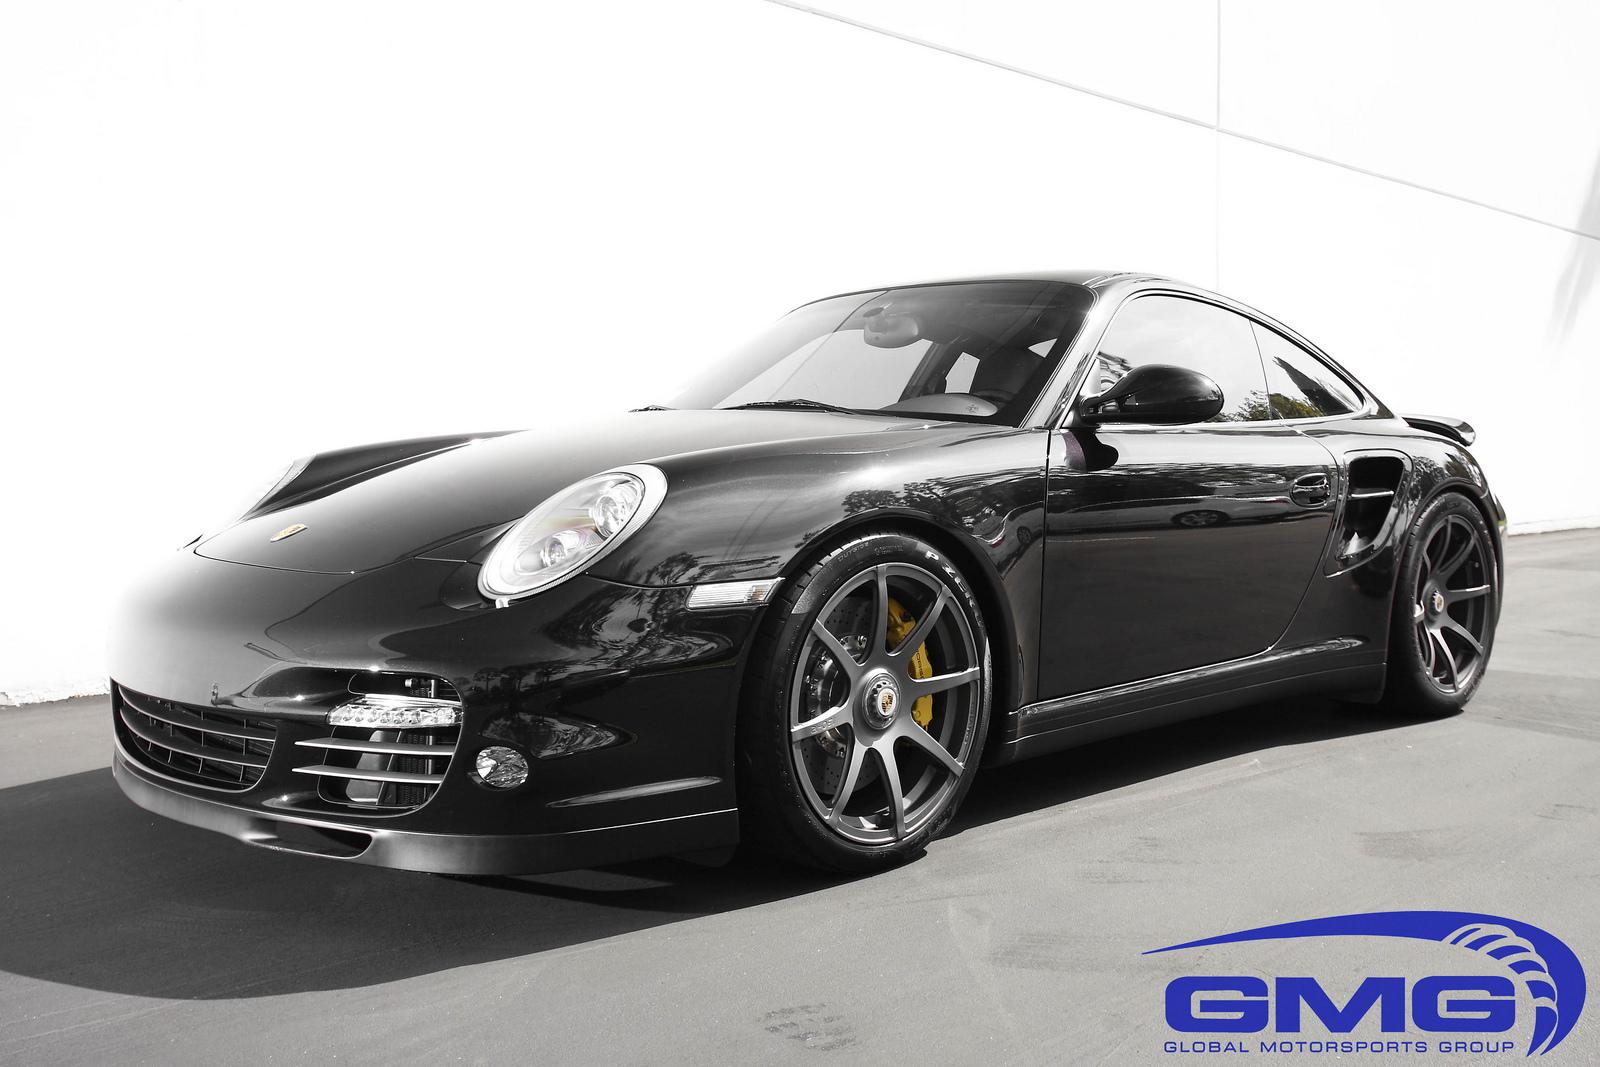 997 turbo s lms wheels gmg racing. Black Bedroom Furniture Sets. Home Design Ideas